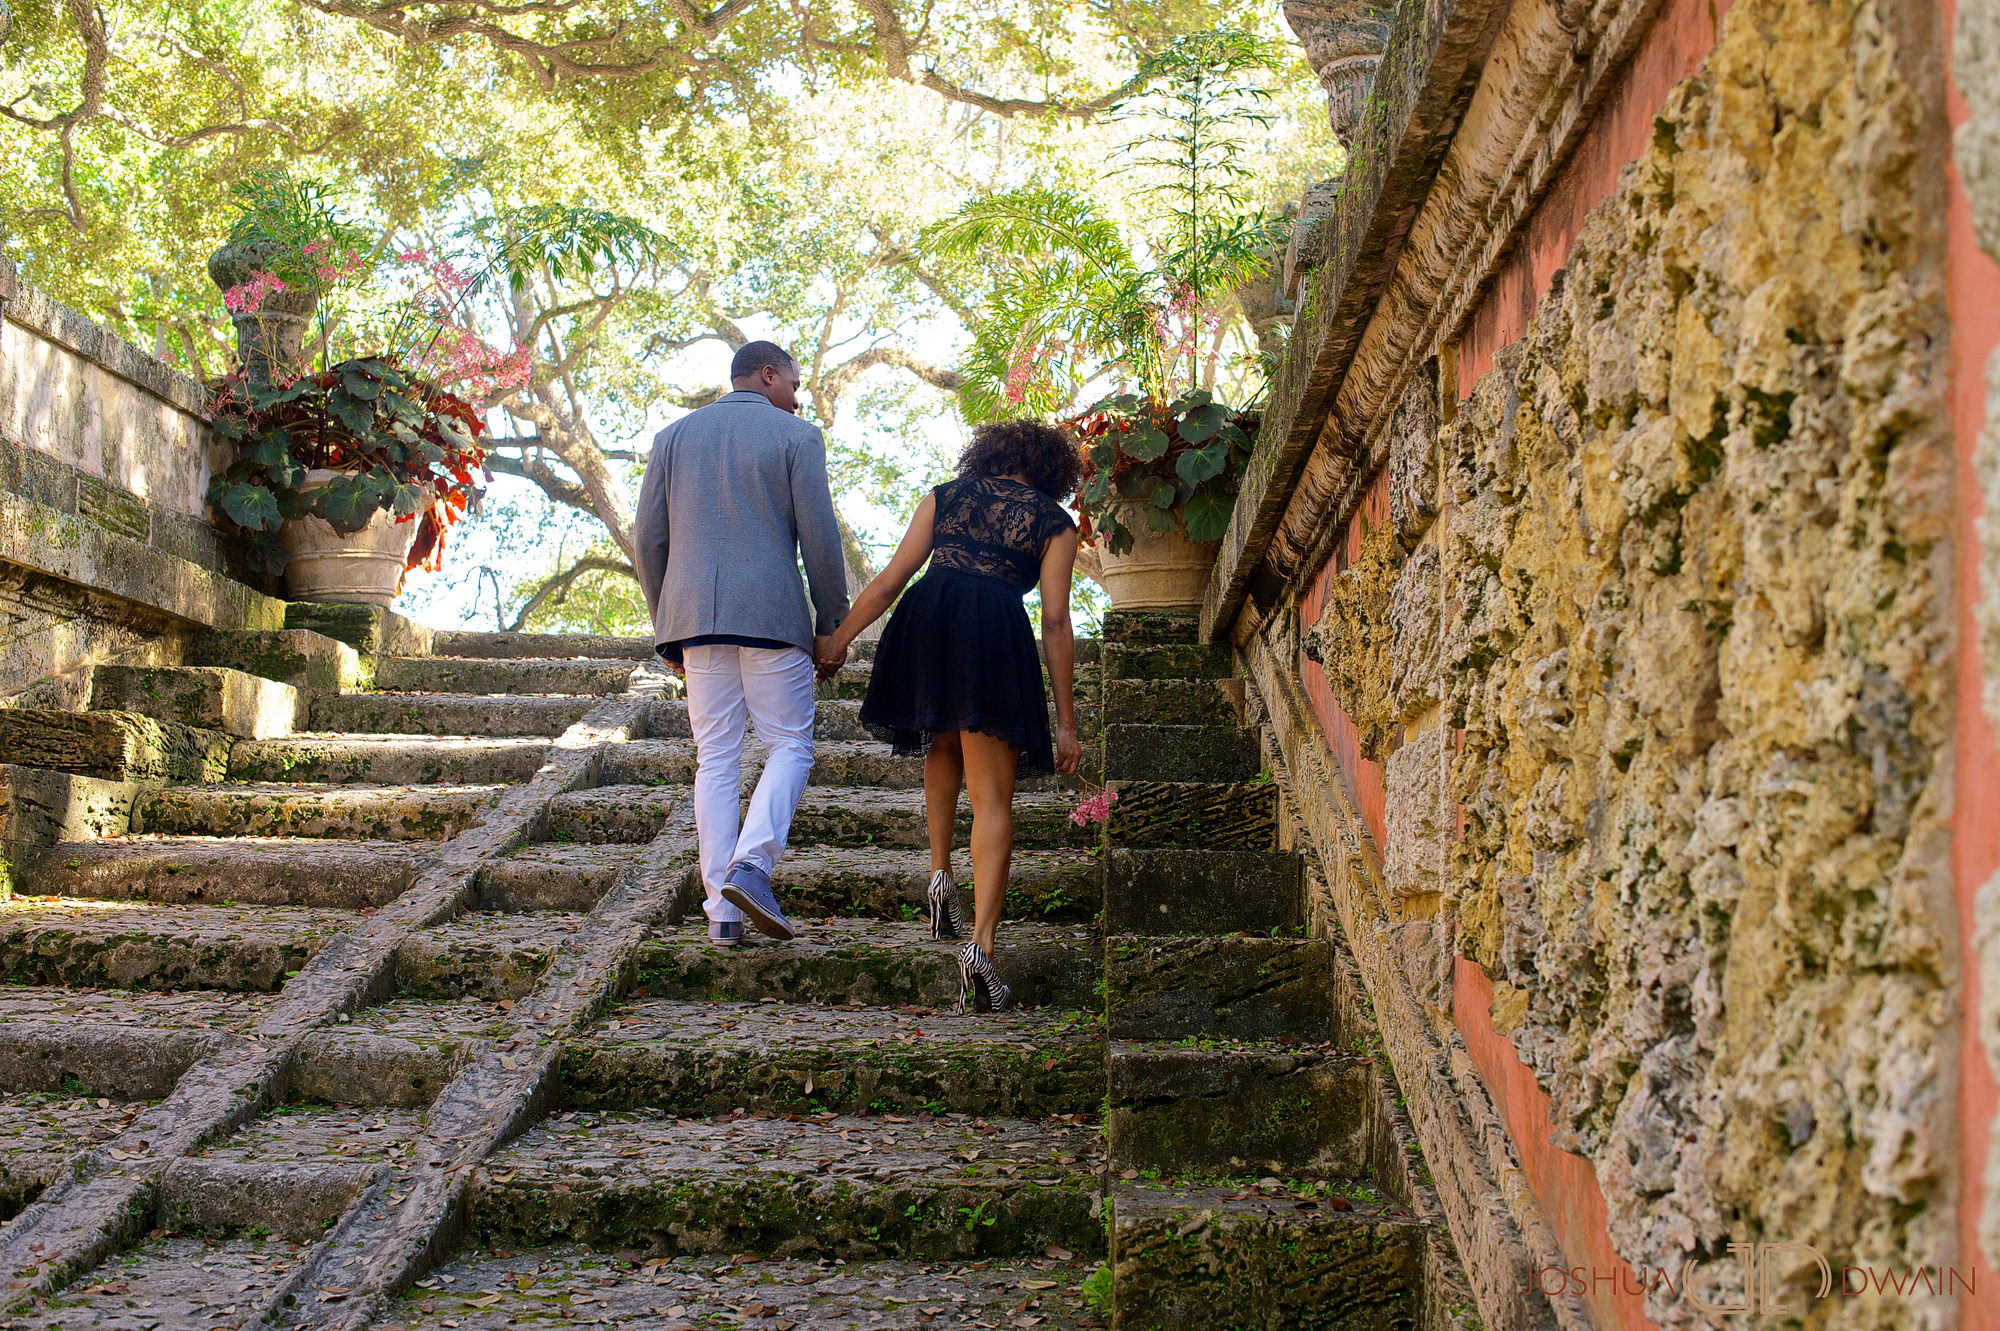 danielle-dowani-007-vizcaya-museum-gardens-miami-florida-wedding-photographer-joshua-dwain